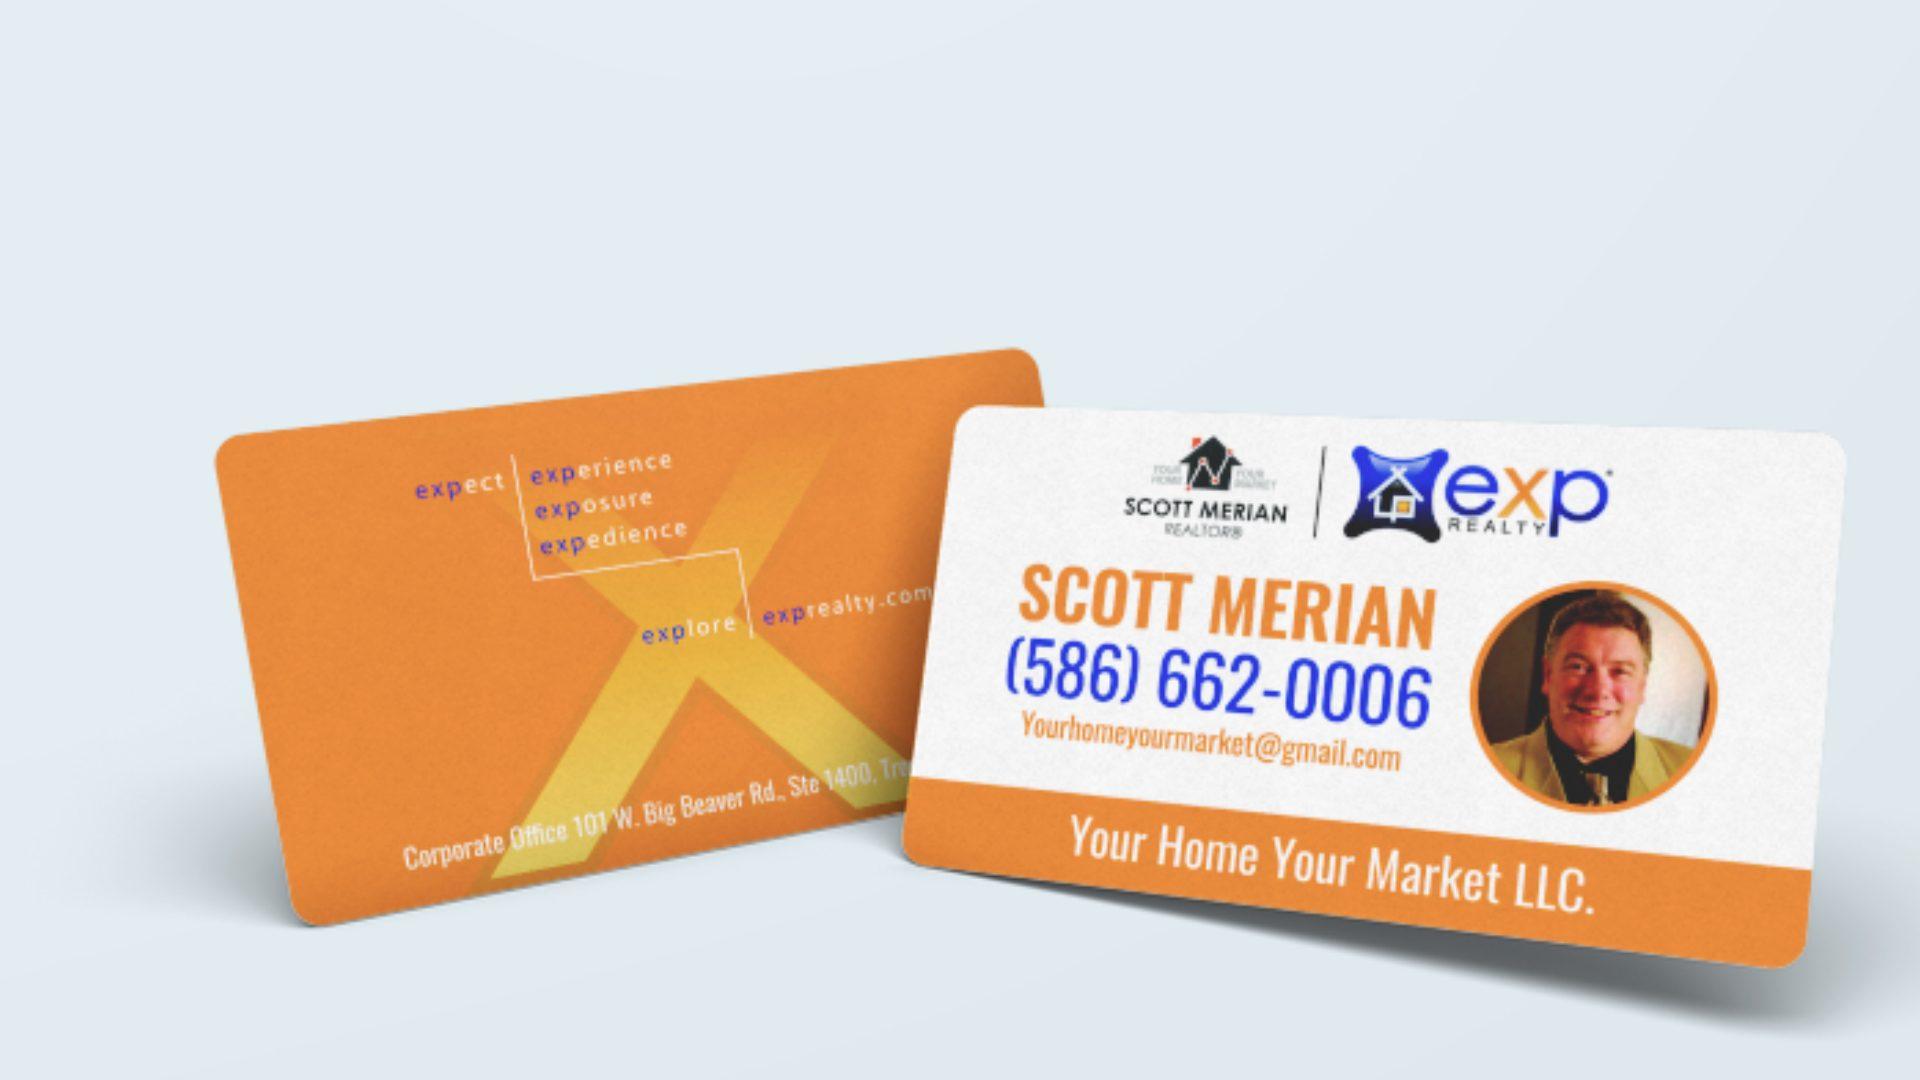 Your Home Your Market LLC - Scott Merian's Cards (1)